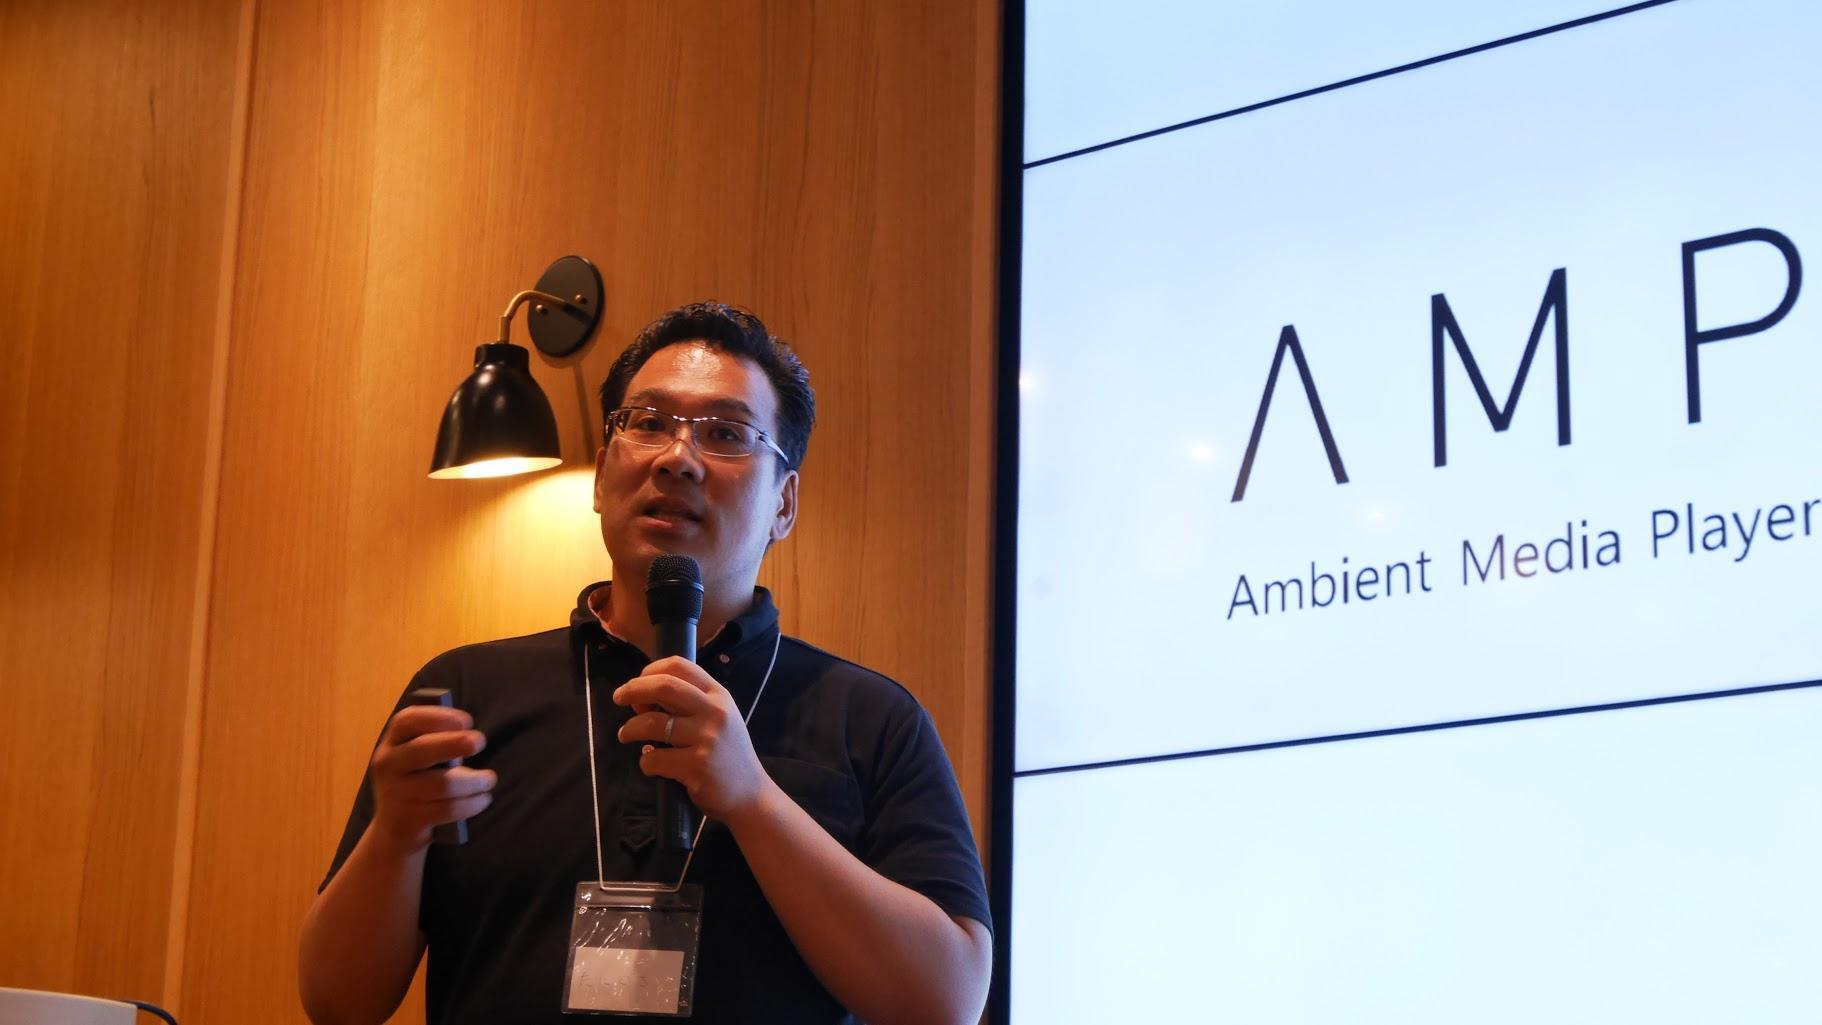 AMPプレゼンテーション_AMP presentation